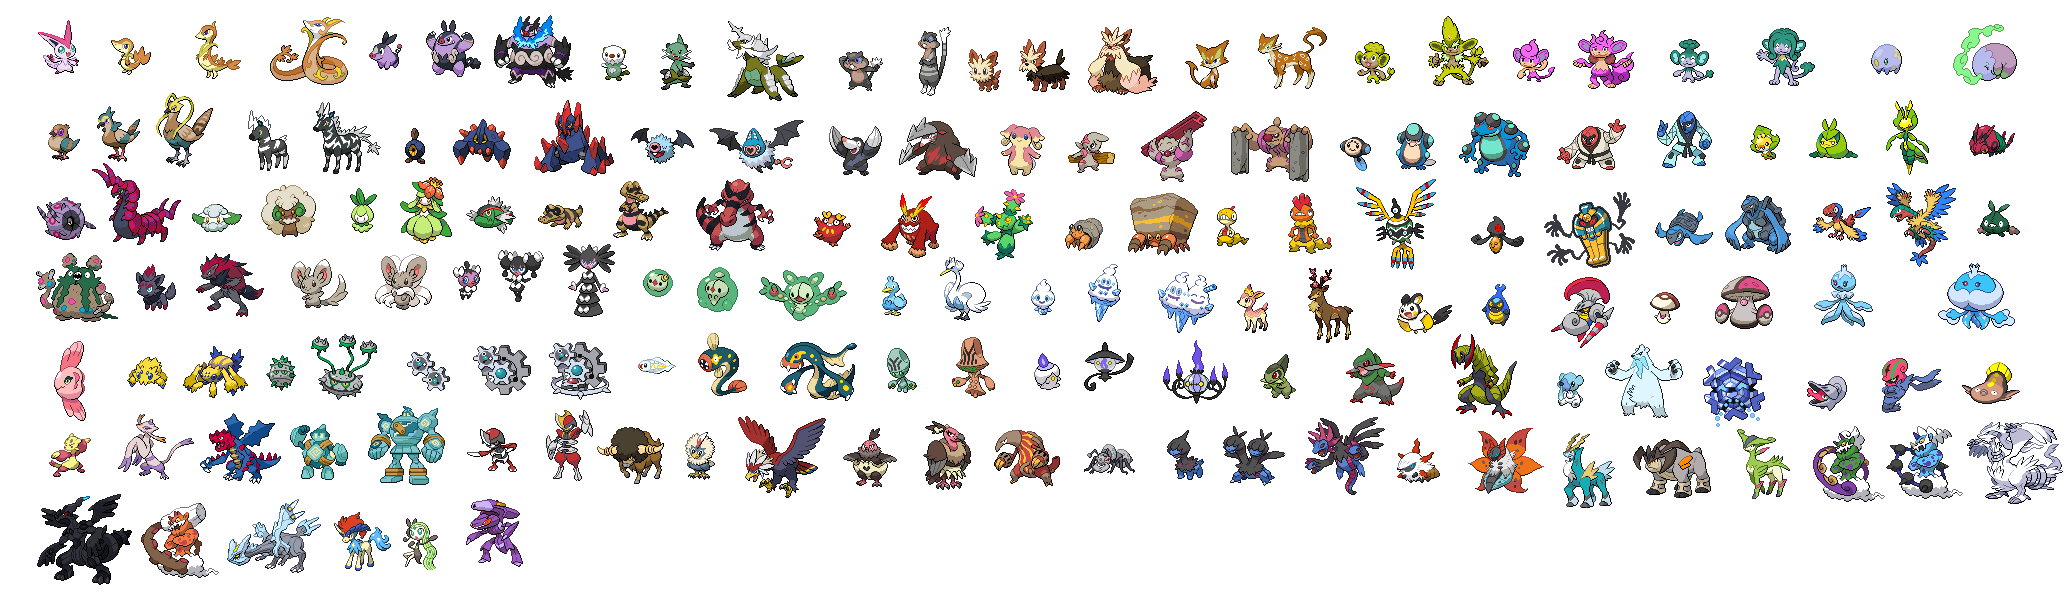 unova pokemon pixel art - photo #6